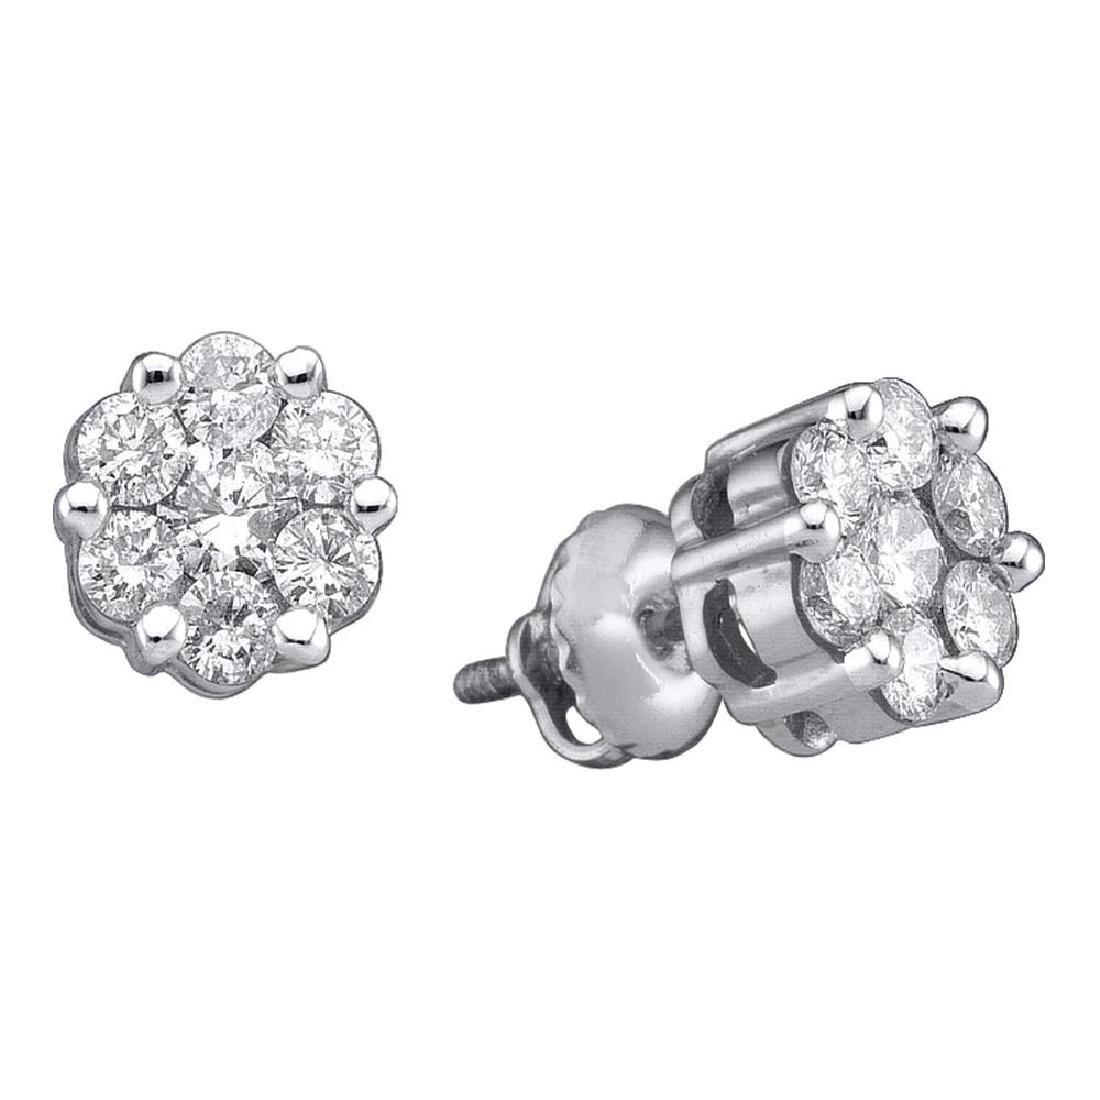 1 CTW Diamond Flower Screwback Stud Earrings 14k White